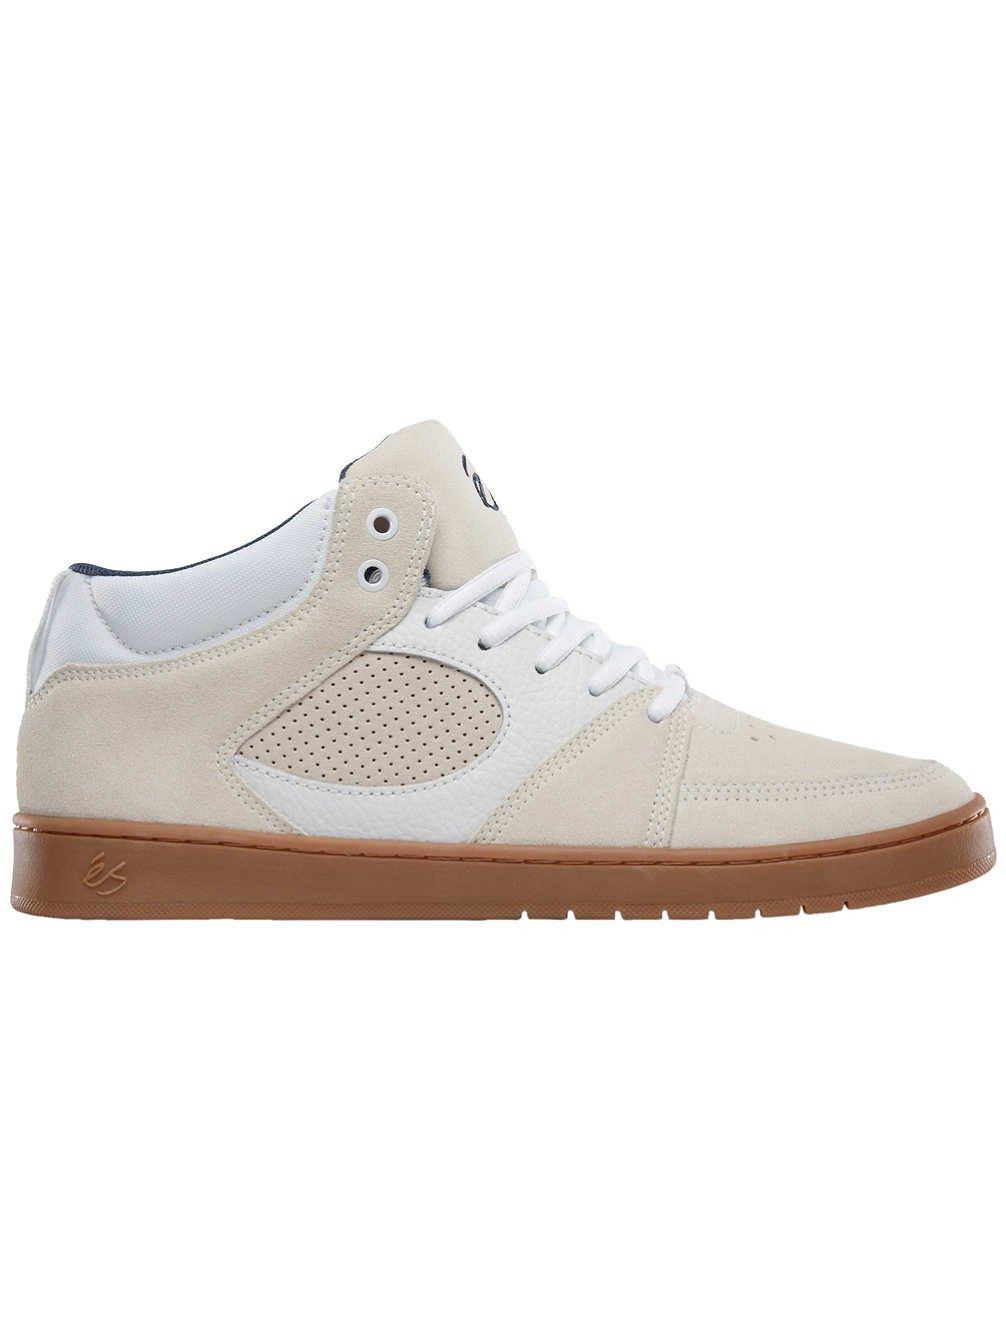 eS Men's Accel Slim Mid Skate Shoe 13 D(M) US White/Gum